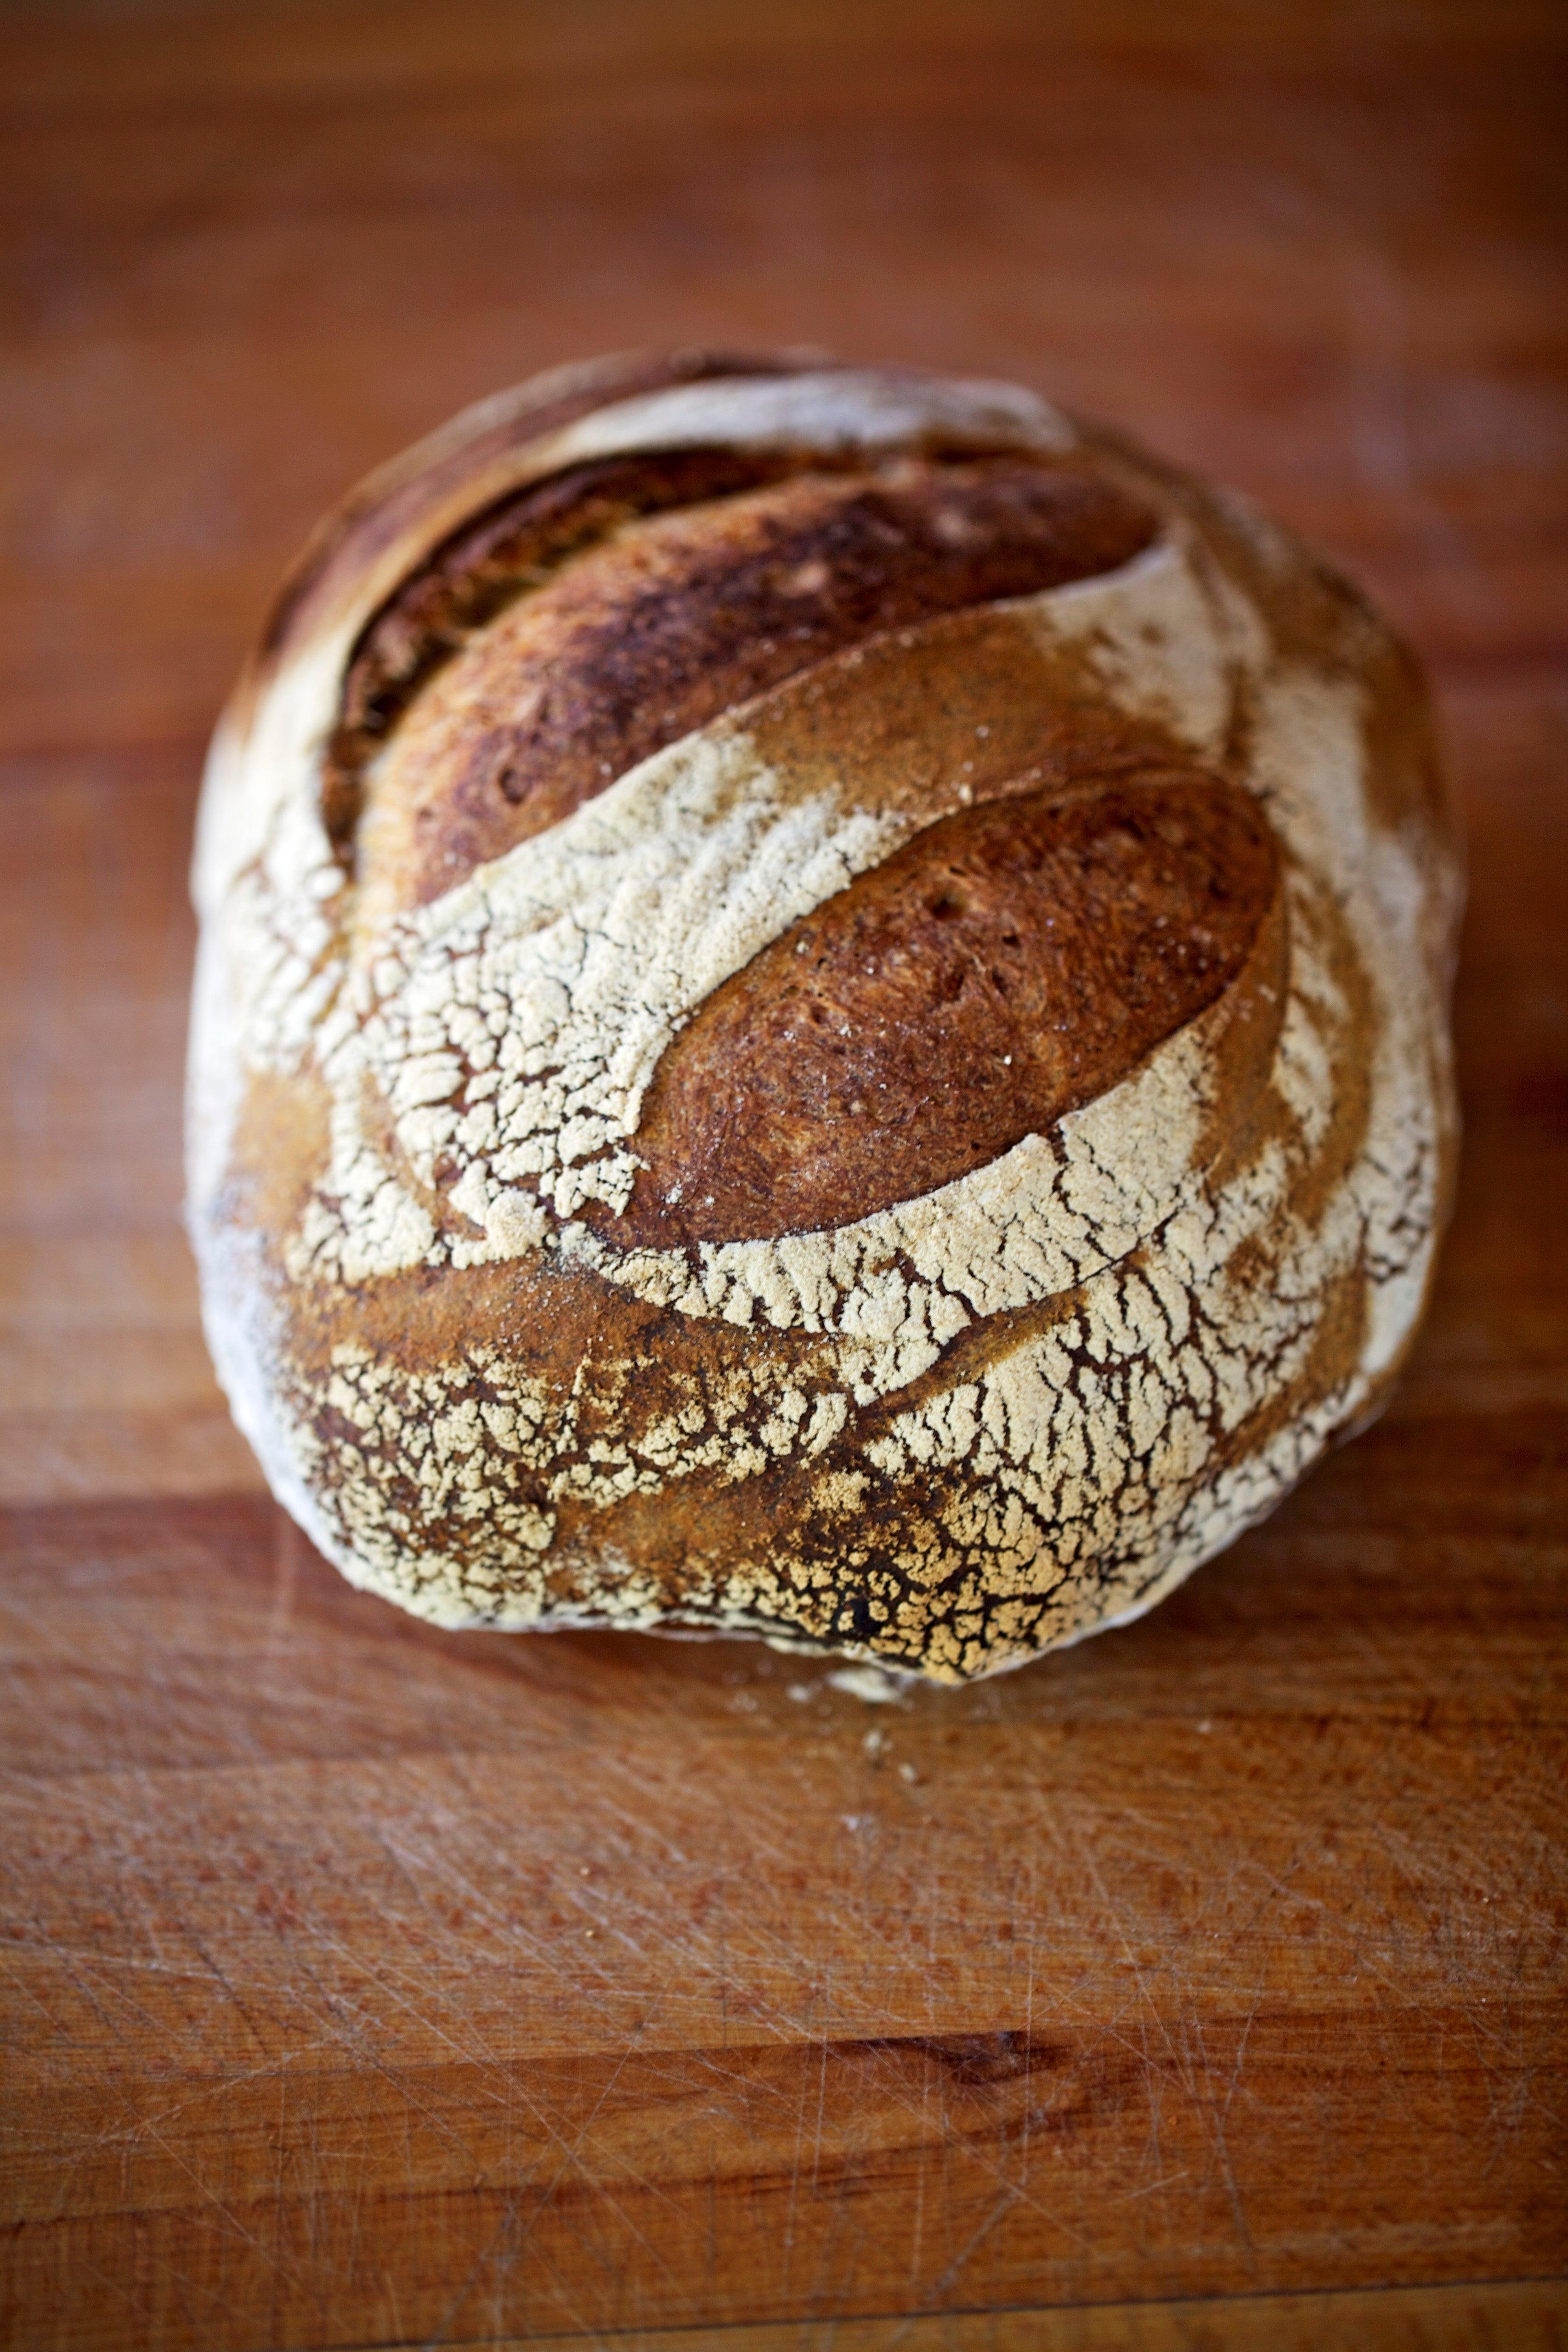 San Francisco sourdough style bread